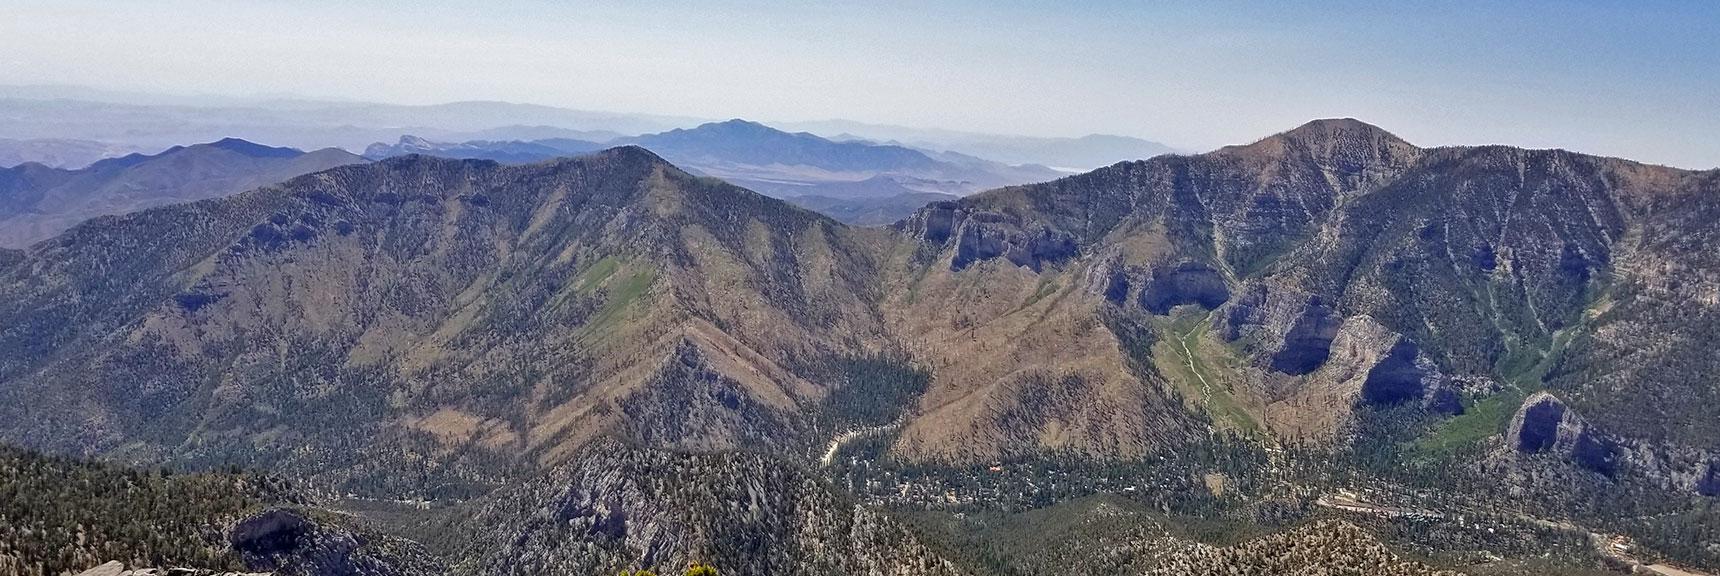 Harris Mt., Griffith Peak and Lovell Canyon Viewed from Mummy's Toe Summit   Mummy Mountain's Toe, Mt. Charleston Wilderness, Nevada